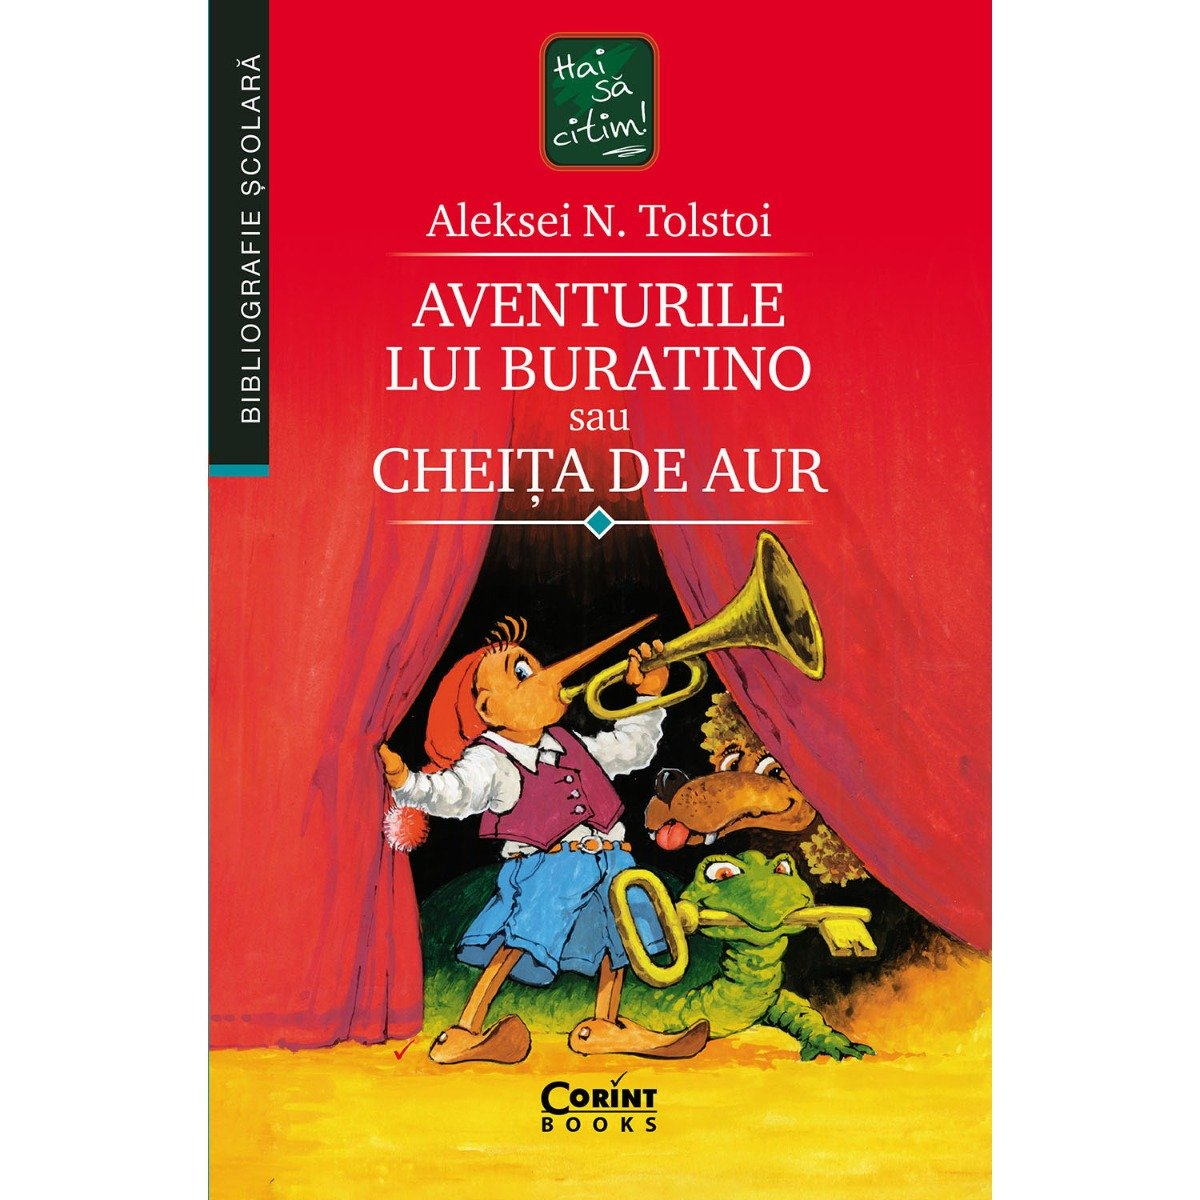 Carte Editura Corint, Aventurile lui Buratino sau cheita de aur, Aleksei N. Tolstoi